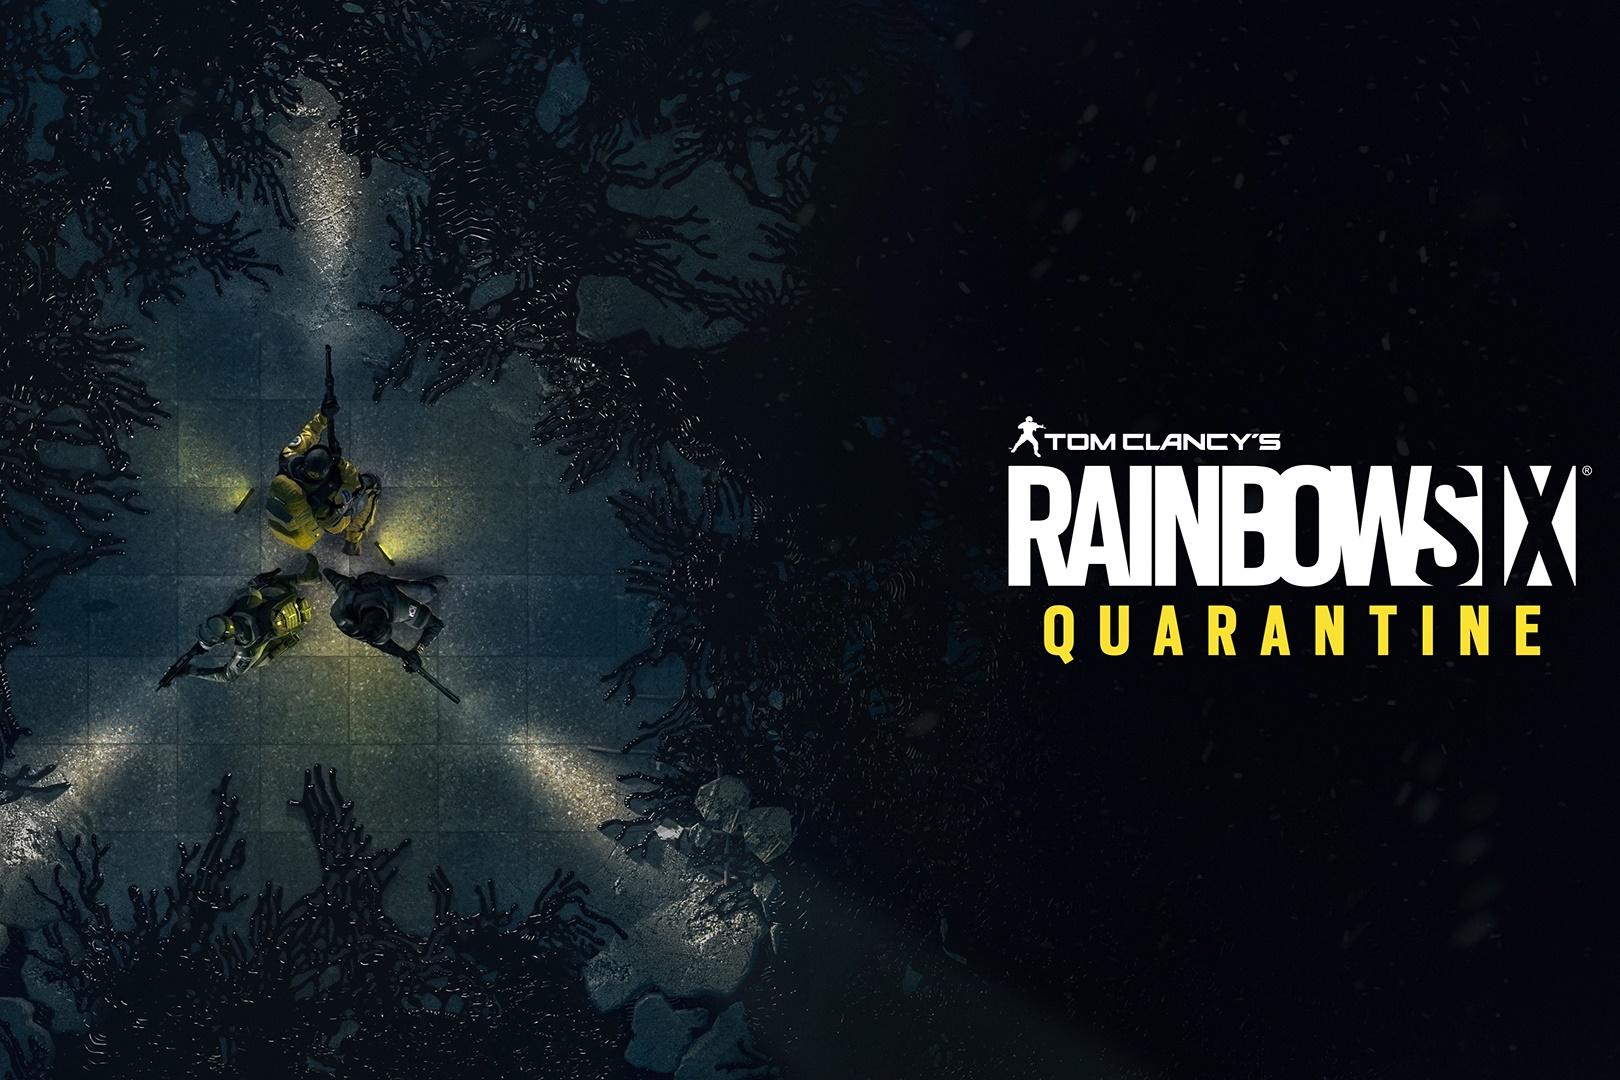 Rainbow Six Quarantine/Parasite: trechos de gameplay vazam na internet